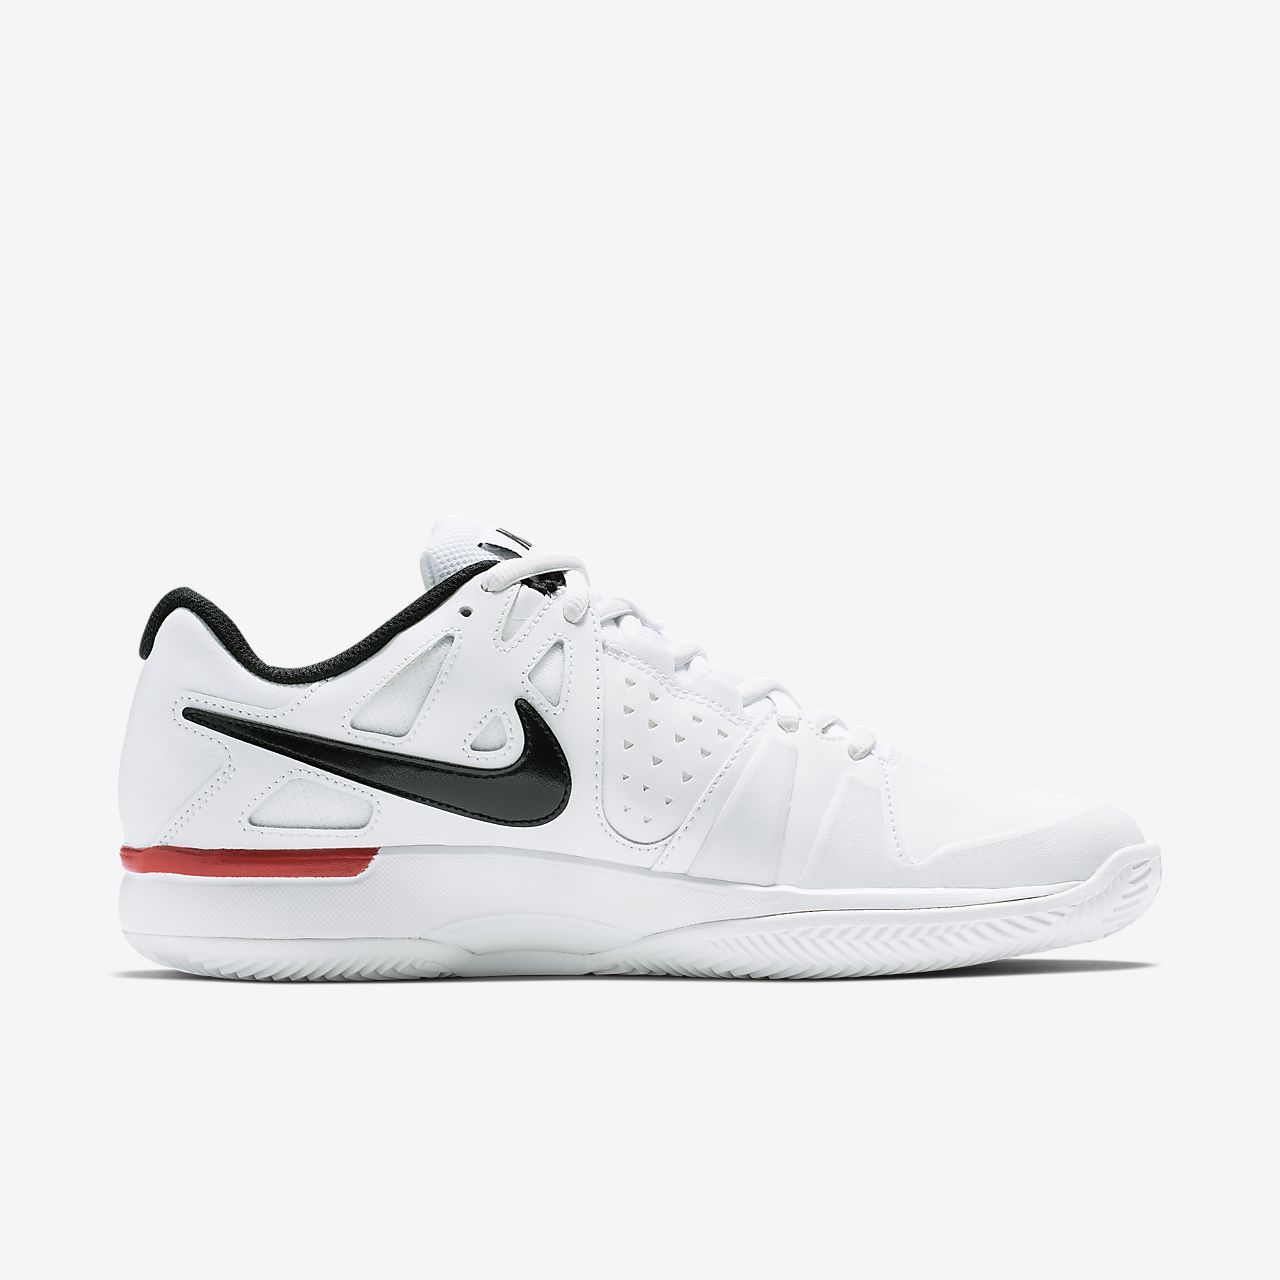 ... NikeCourt Air Vapor Advantage Clay Men's Tennis Shoe